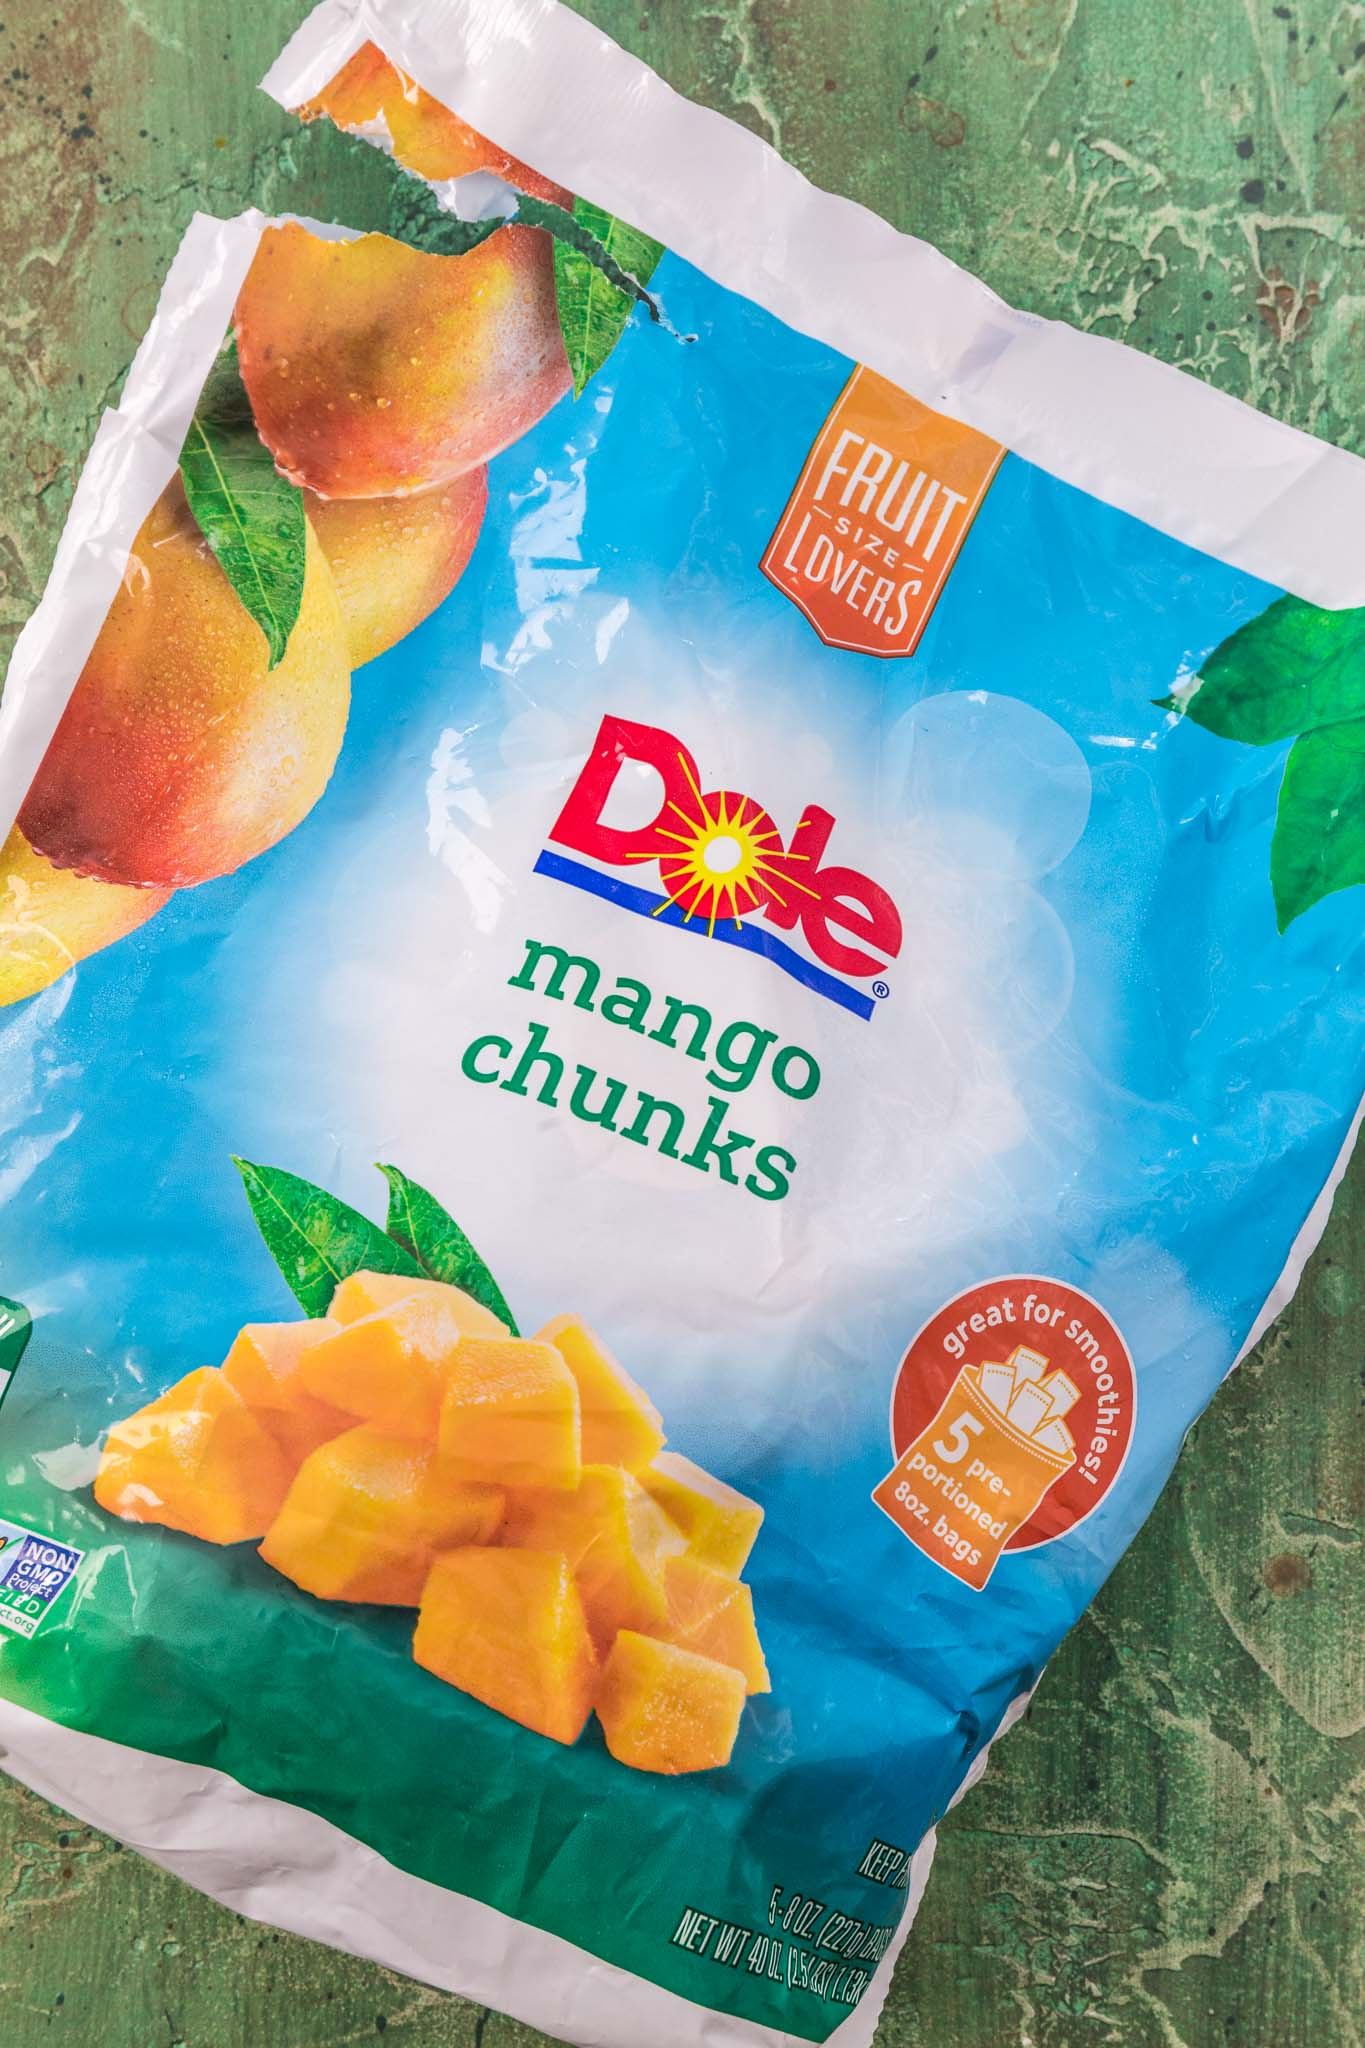 Dole frozen mango chunks